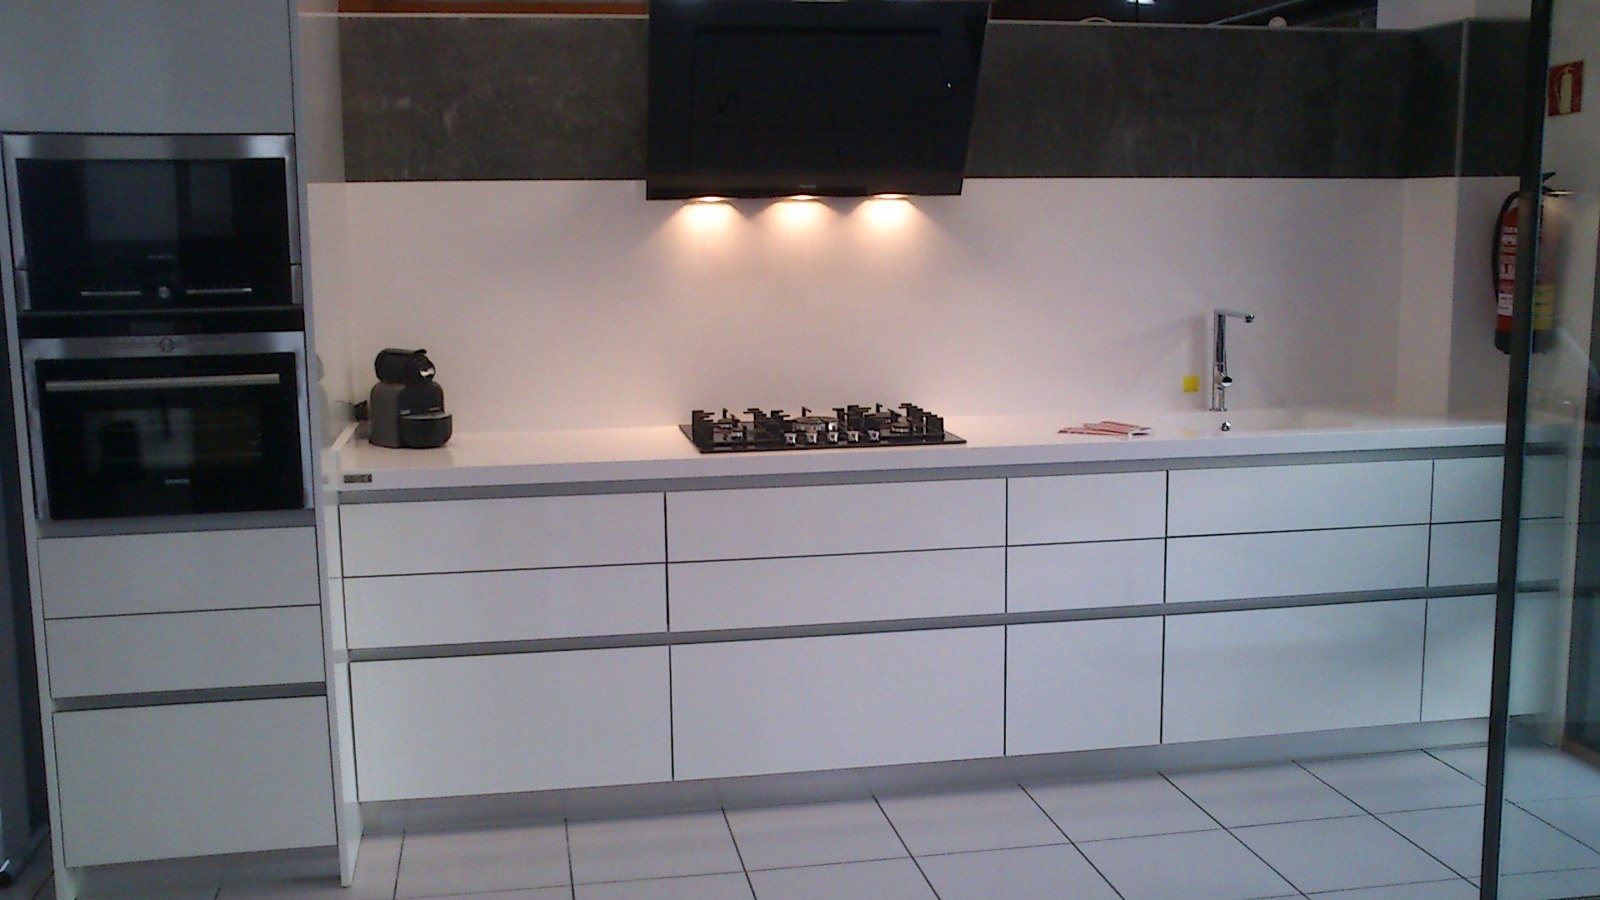 Muebles De Cocina De Exposicion En Zaragoza # azarak.com > Ideas ...